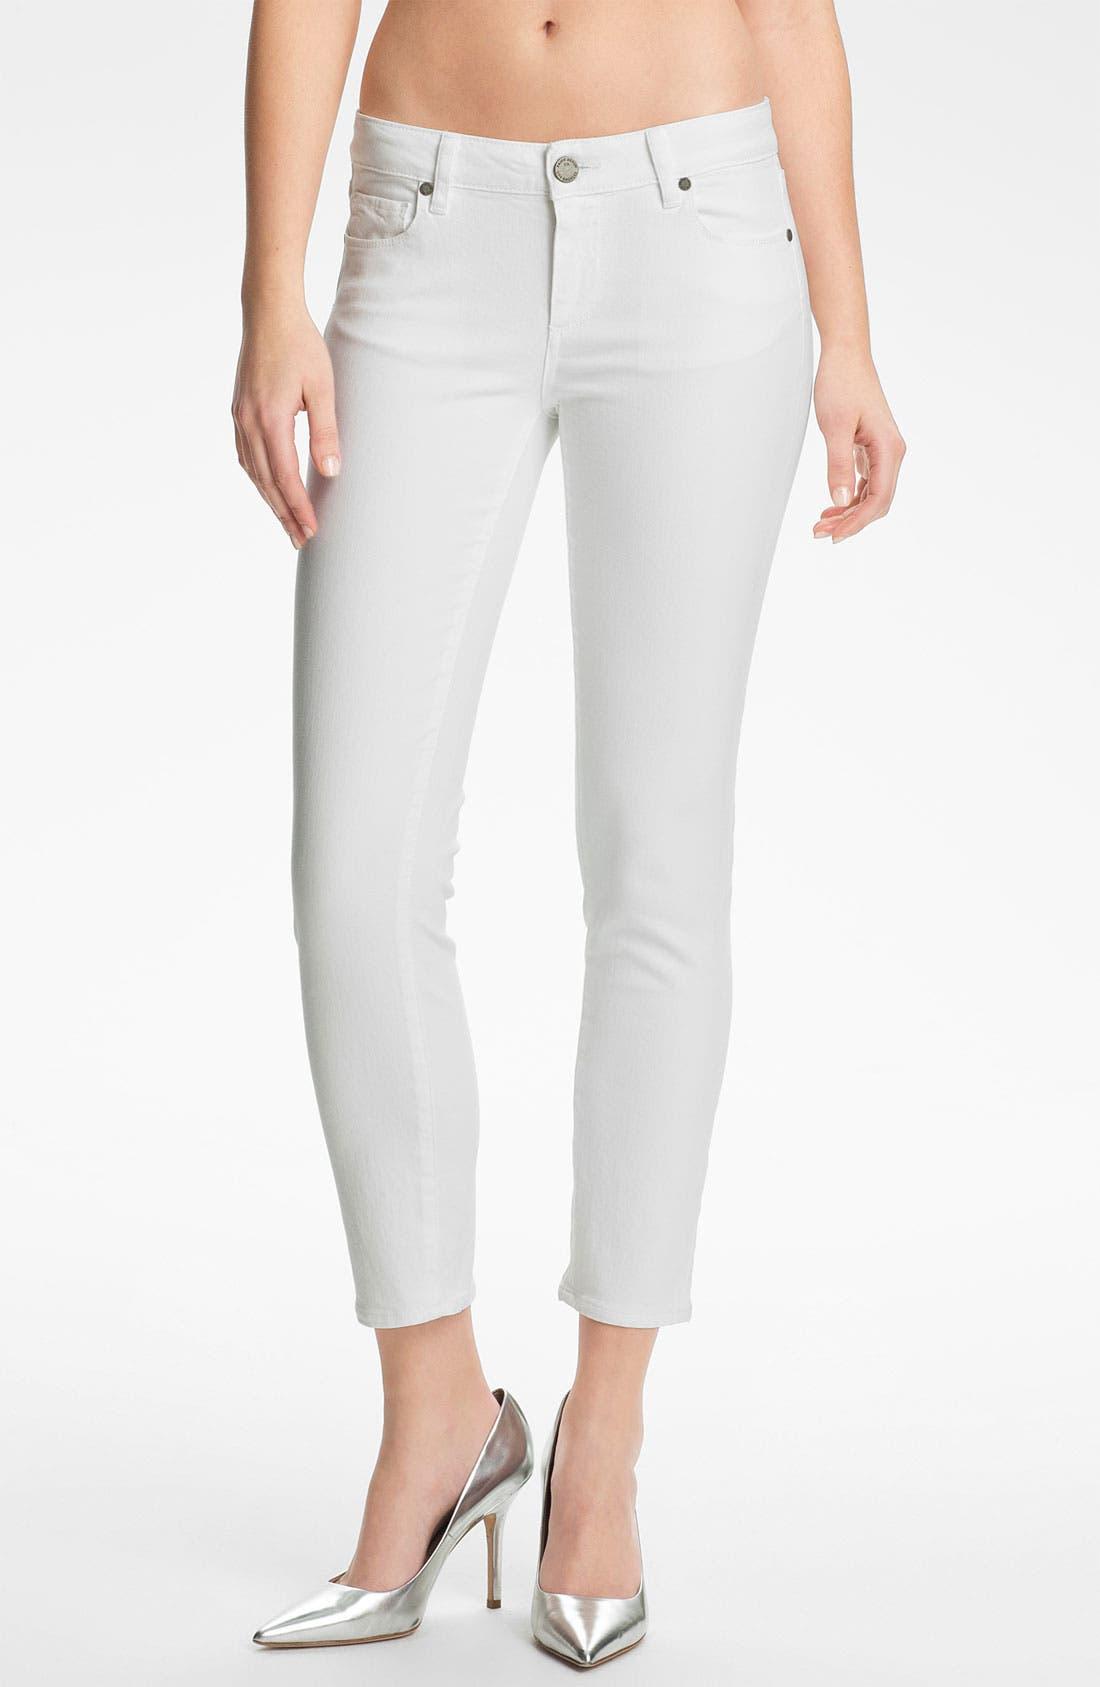 Alternate Image 1 Selected - Paige Denim 'Kylie' Crop Skinny Jeans (Optic White)